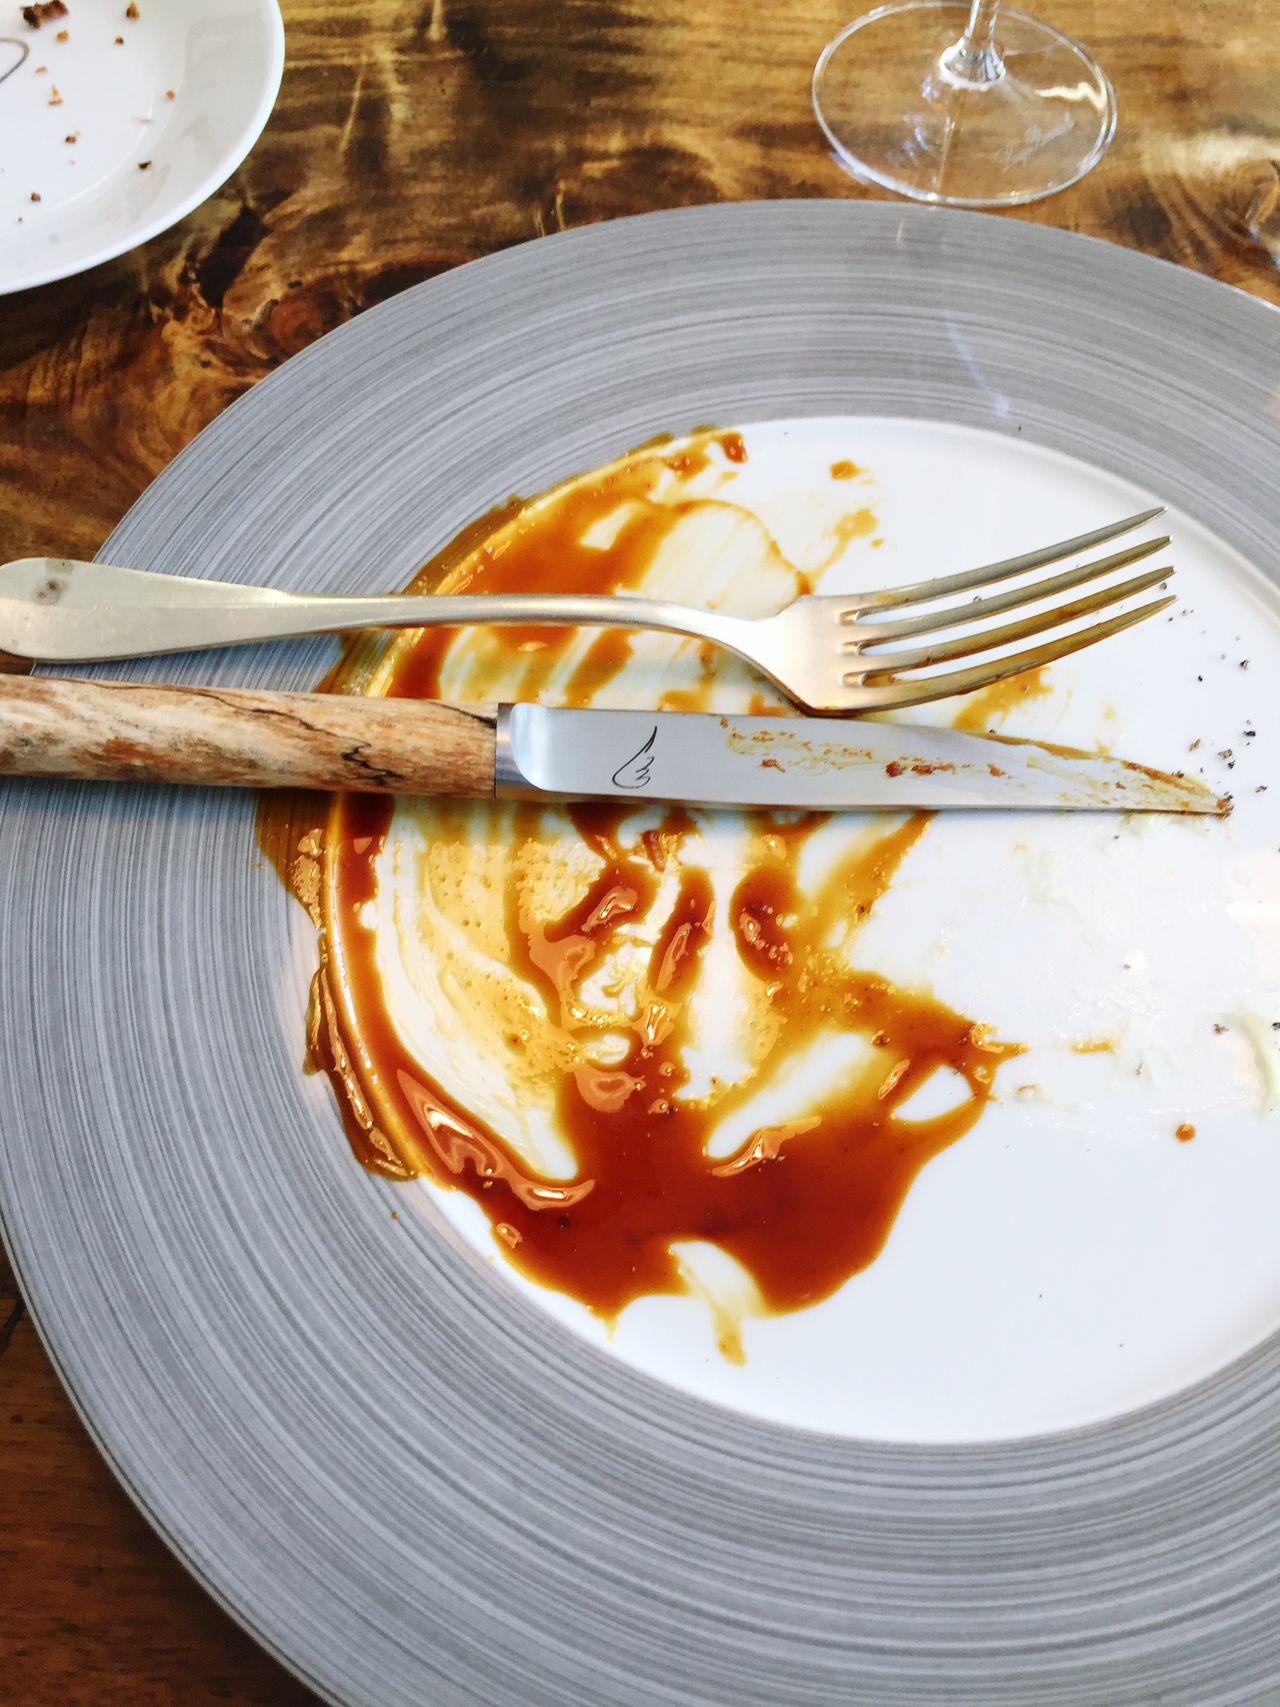 Food Photography Michelin Star Restaurant Dish Over Miam Yummy EyeEm Best Shots